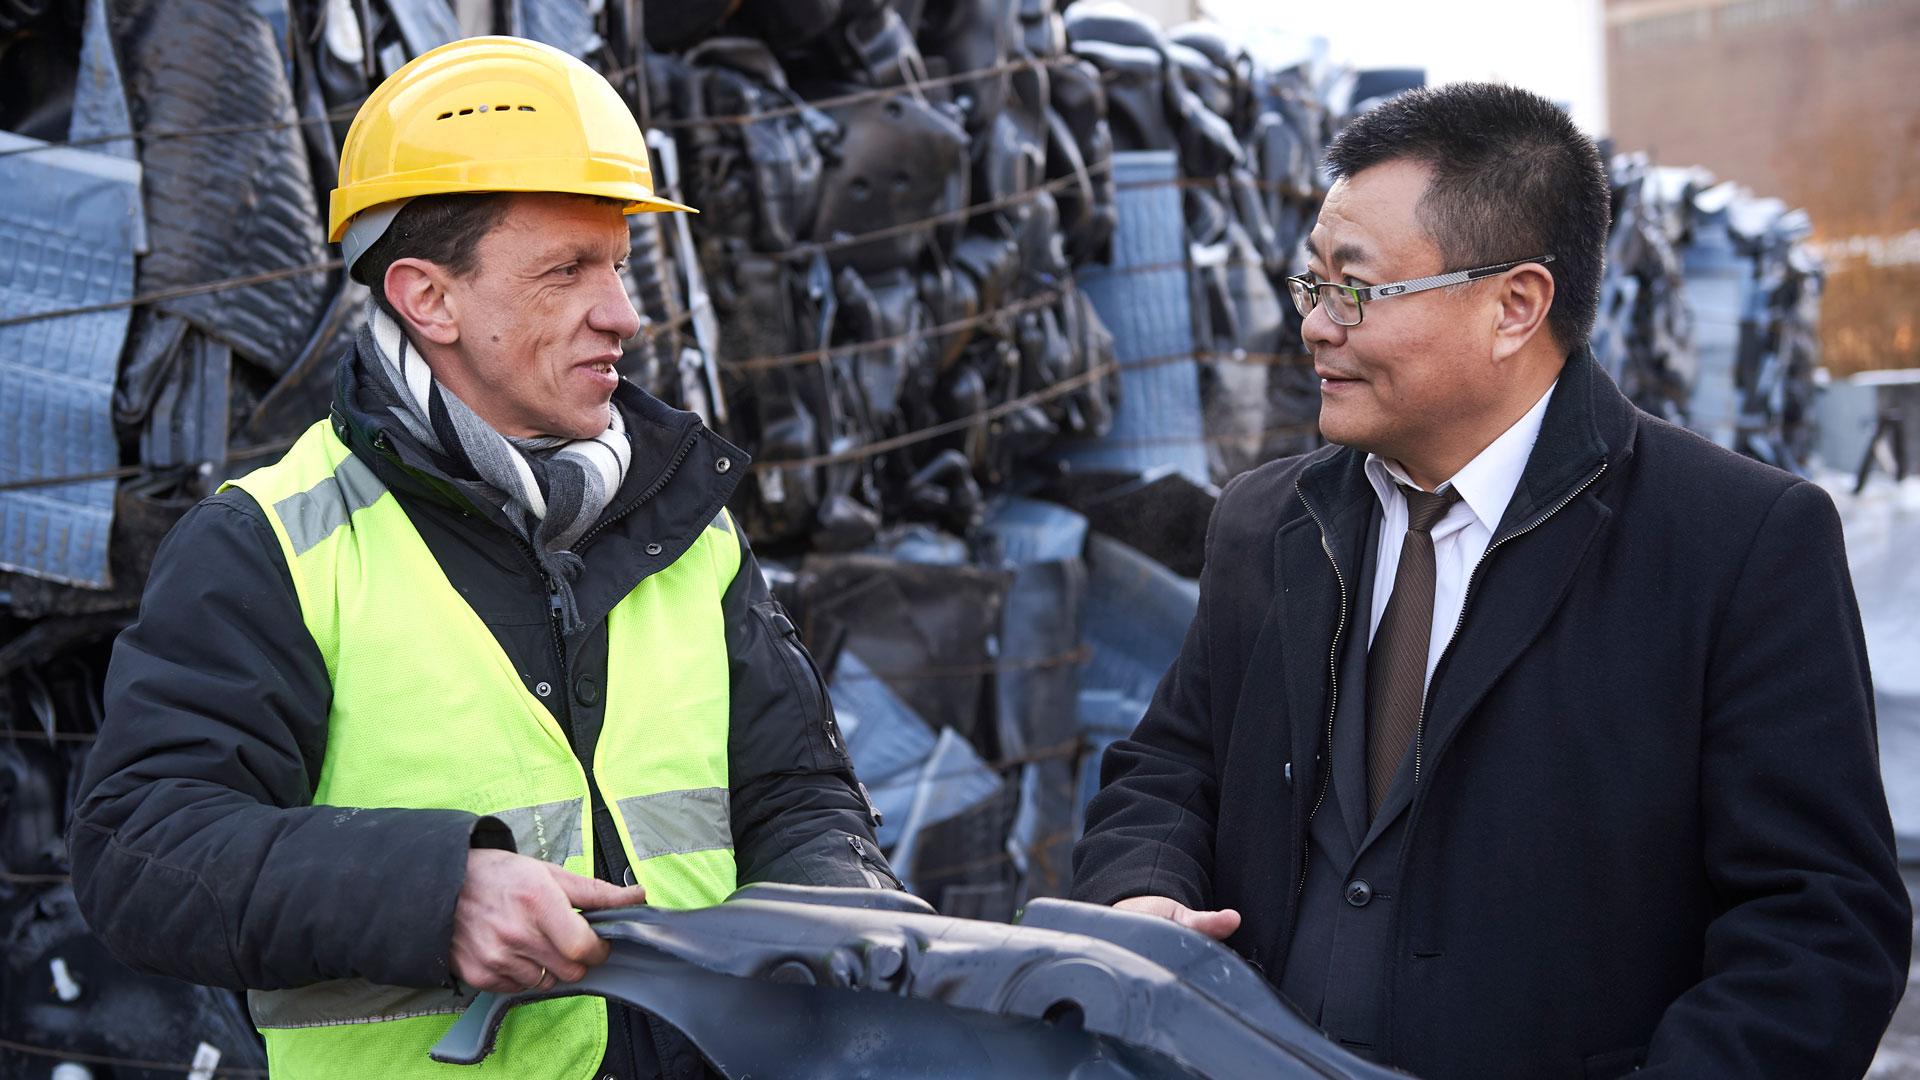 kunststoff recycling personen - Kunststoff-Recycling